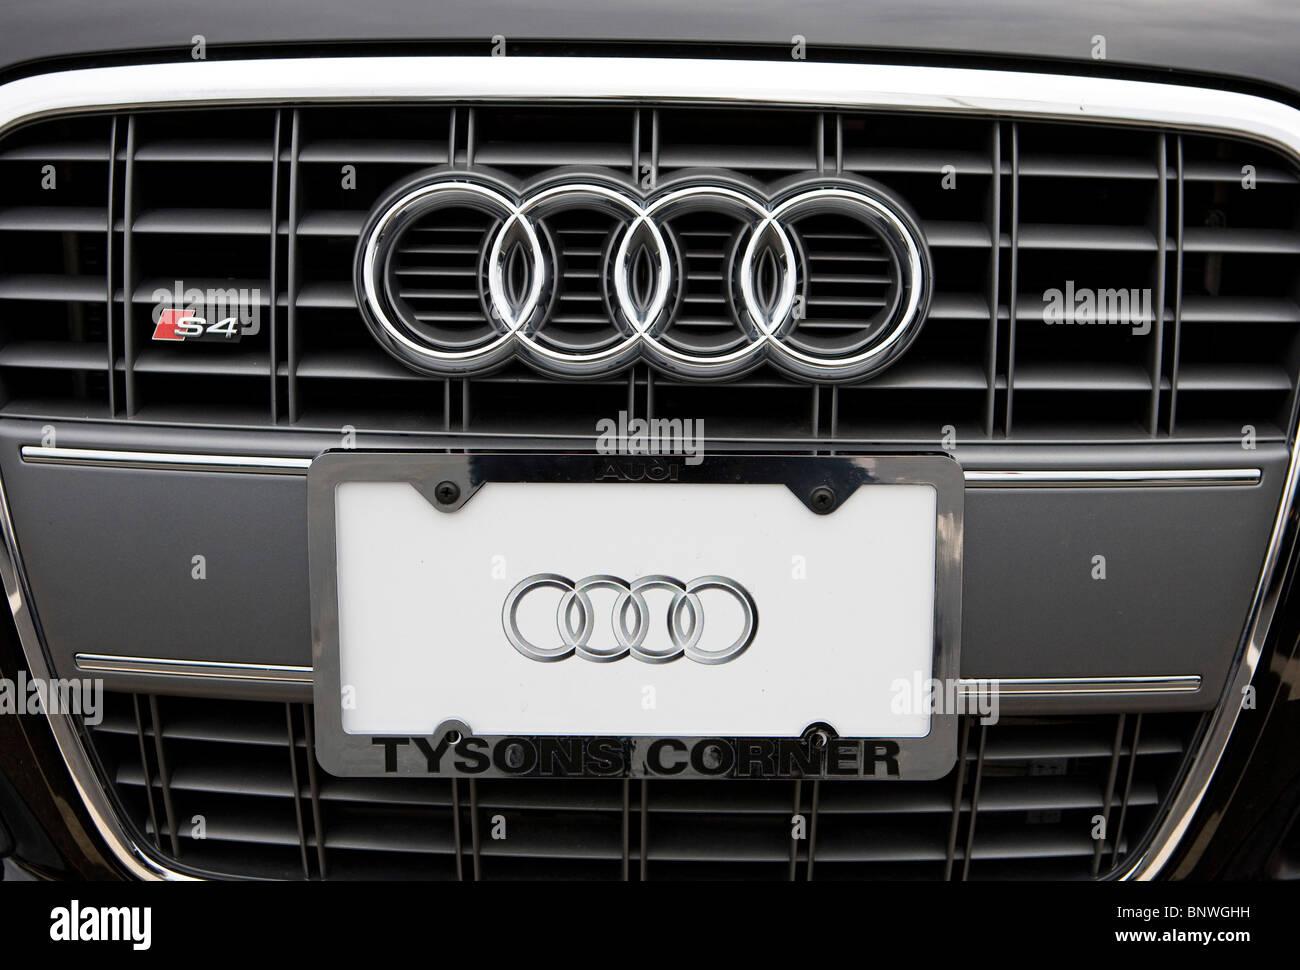 A Porsche and Audi car dealership.  - Stock Image